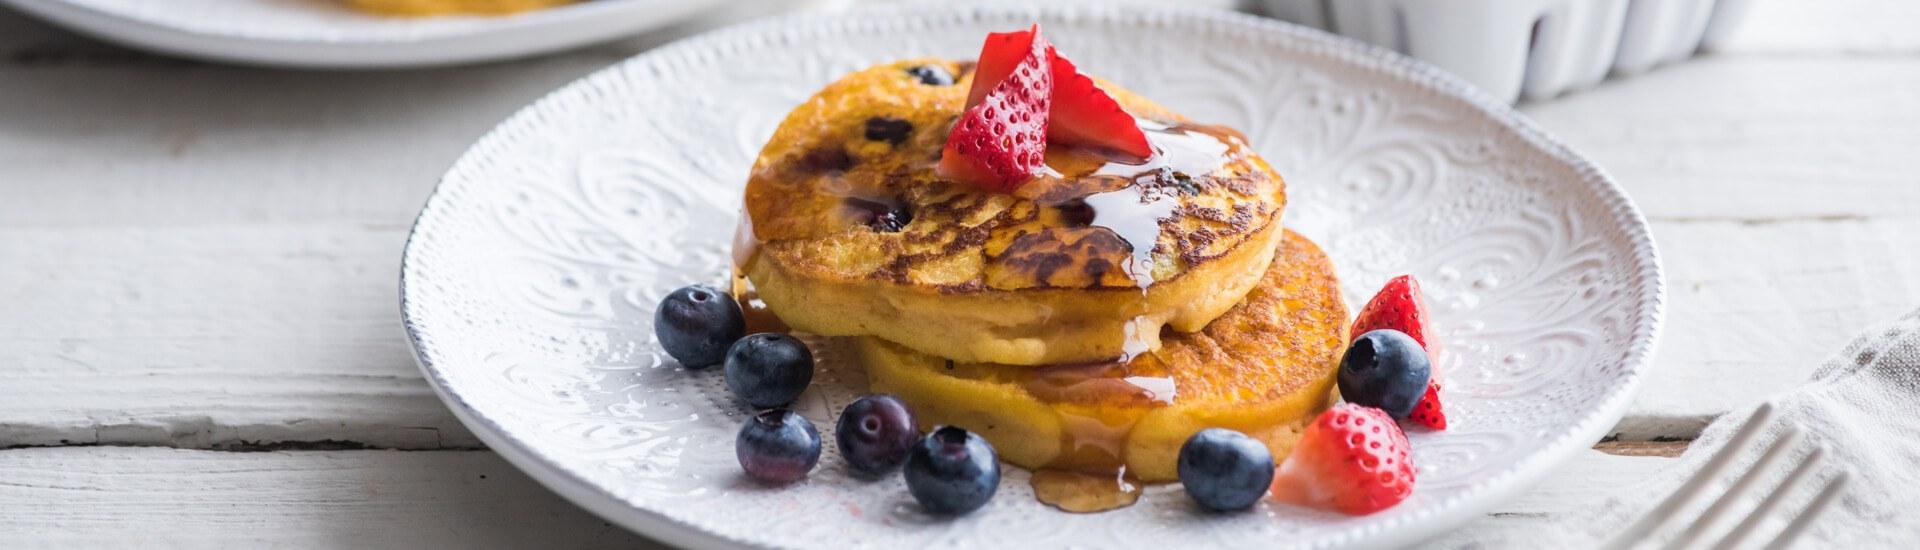 Gluten Free Pumpkin Blueberry Pancakes